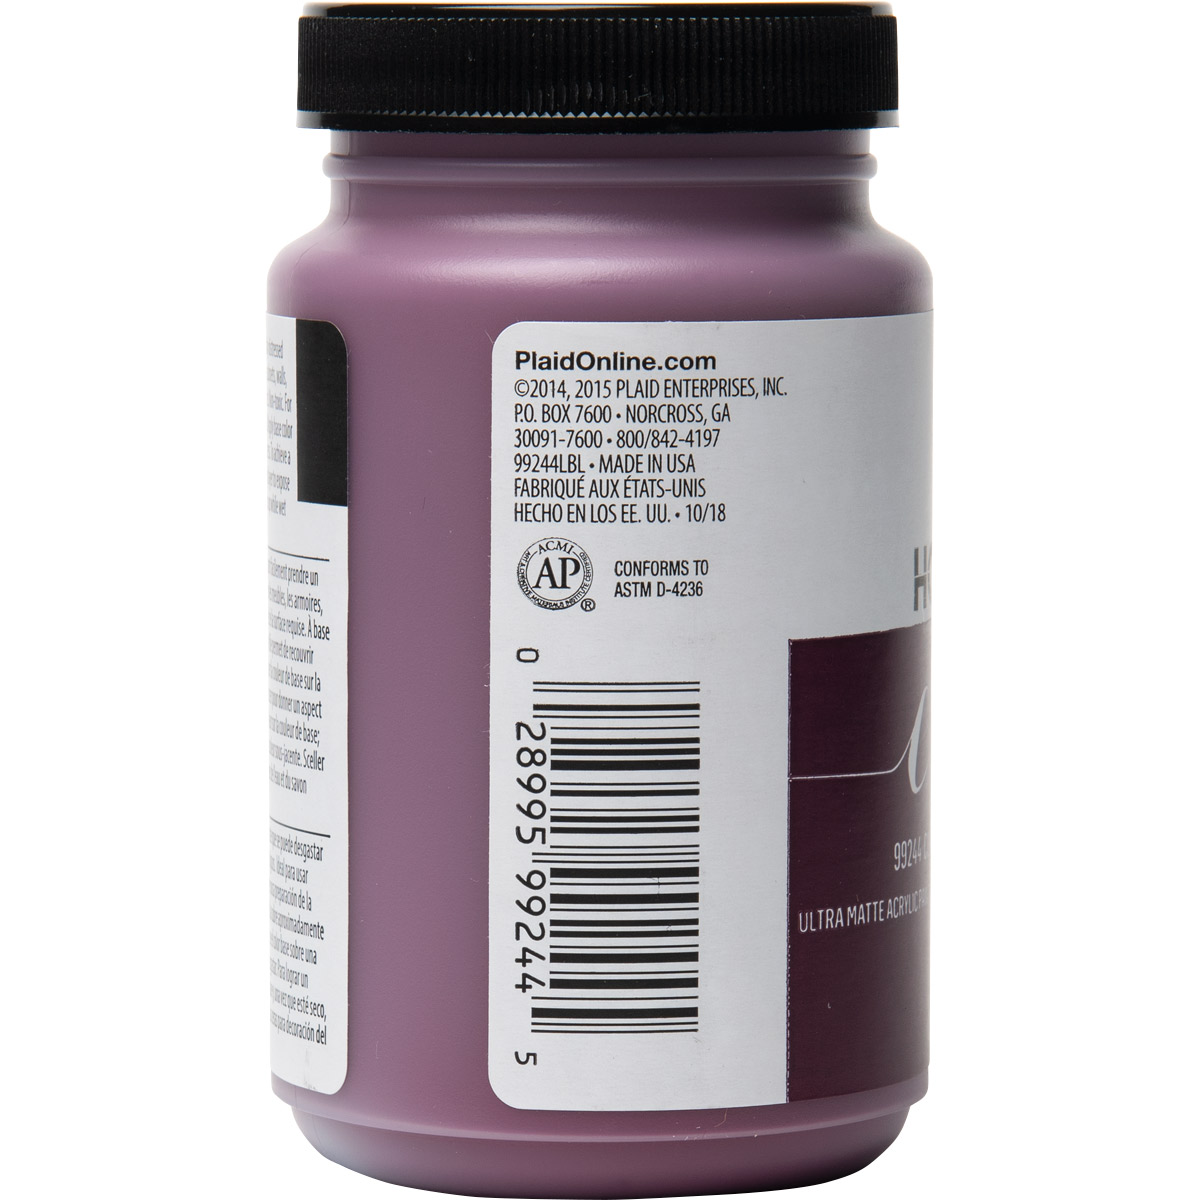 FolkArt ® Home Decor™ Chalk - Currant, 8 oz.